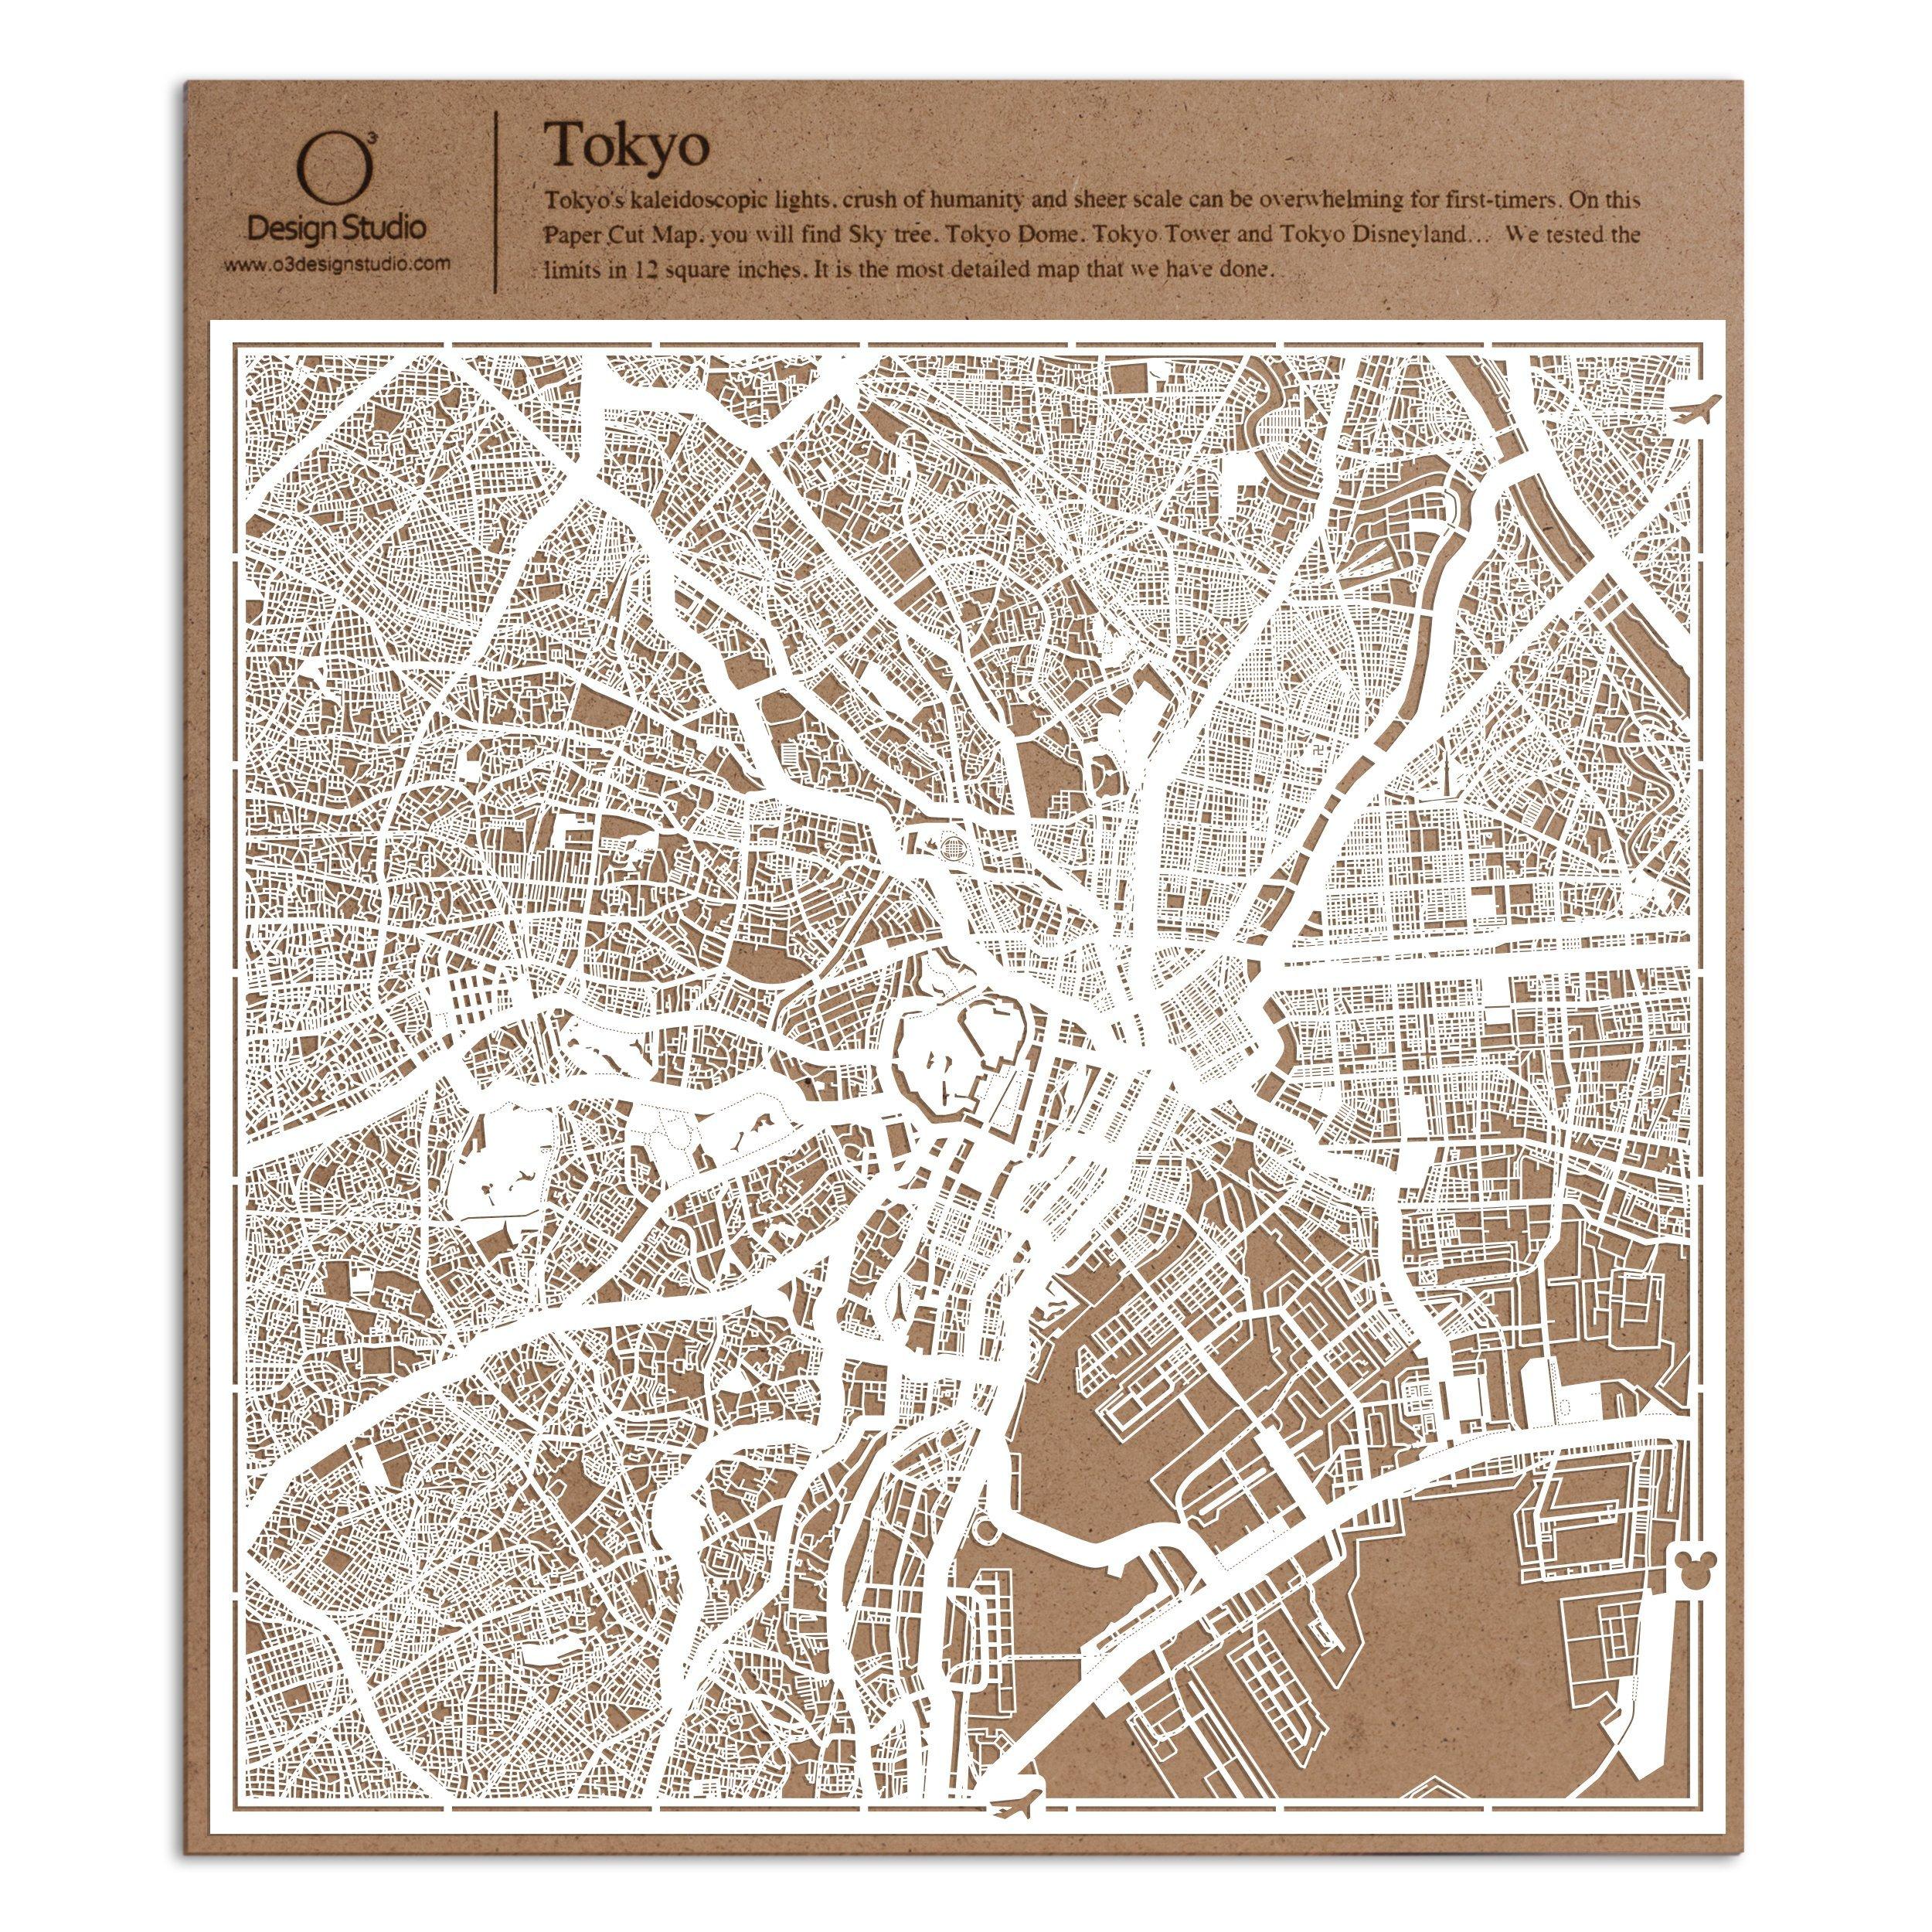 Tokyo Paper Cut Map by O3 Design Studio White 12x12 inches Paper Art